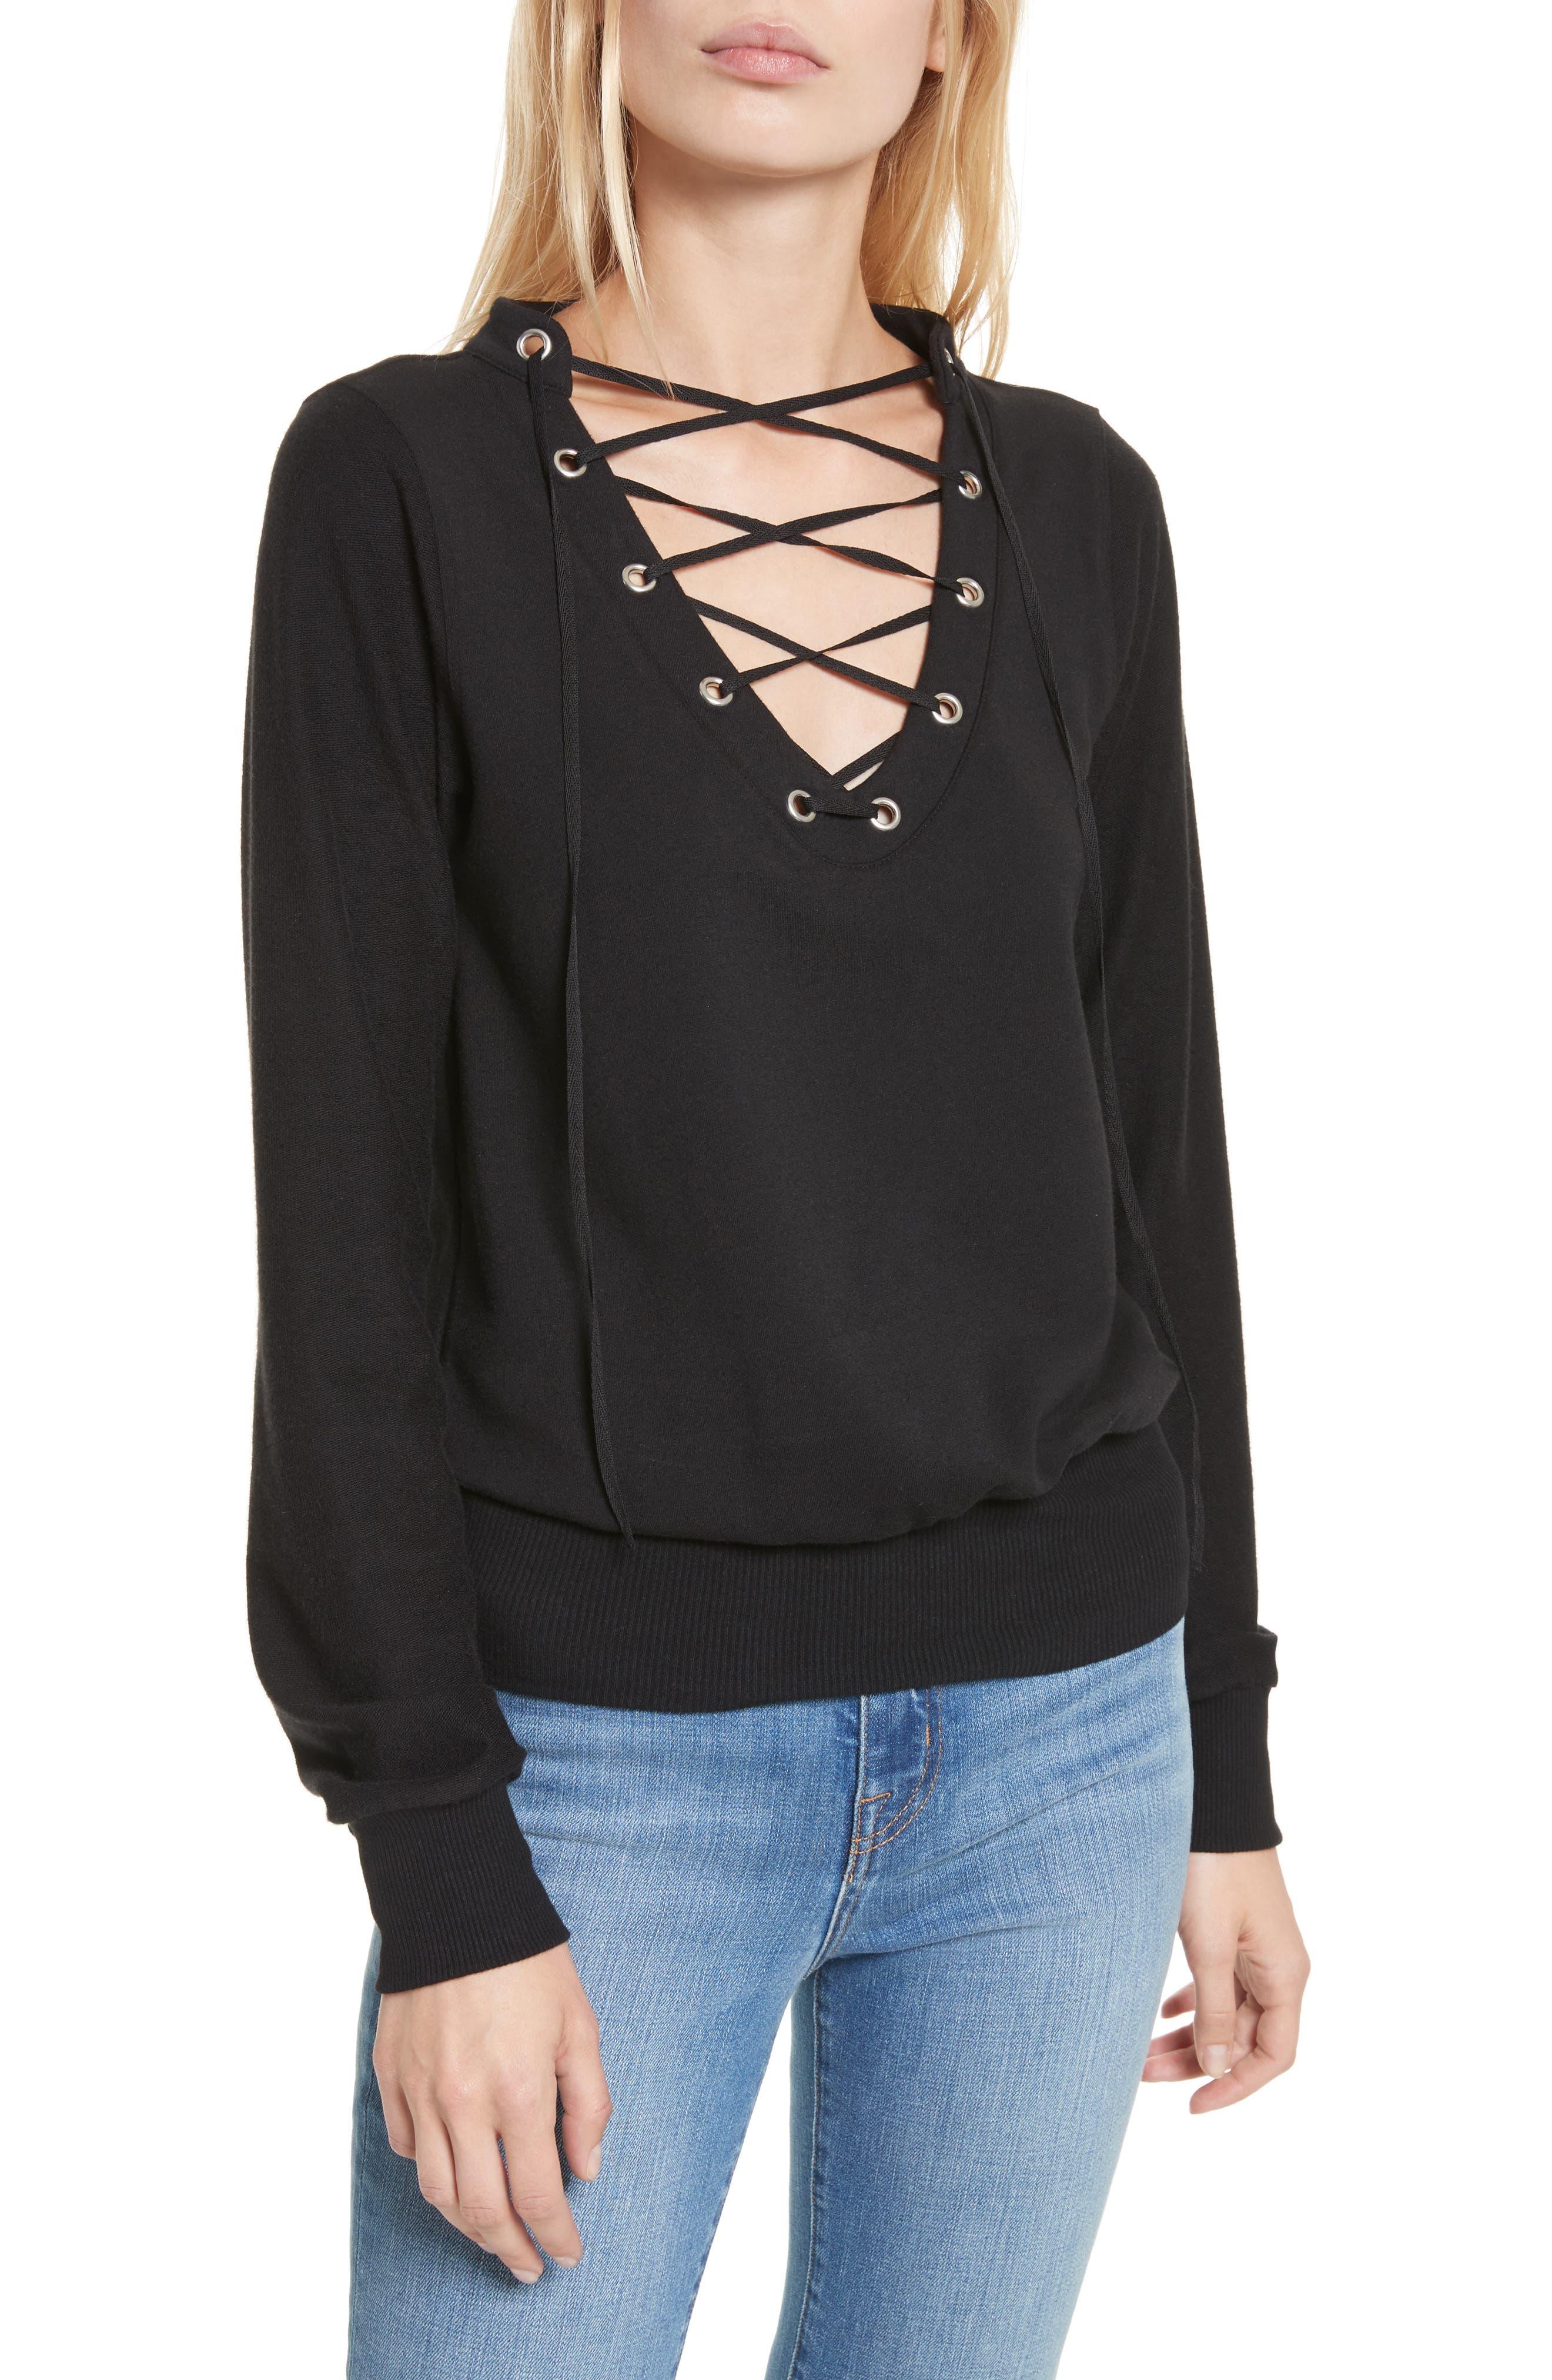 Main Image - L'AGENCE Josilyn Lace-Up Sweatshirt